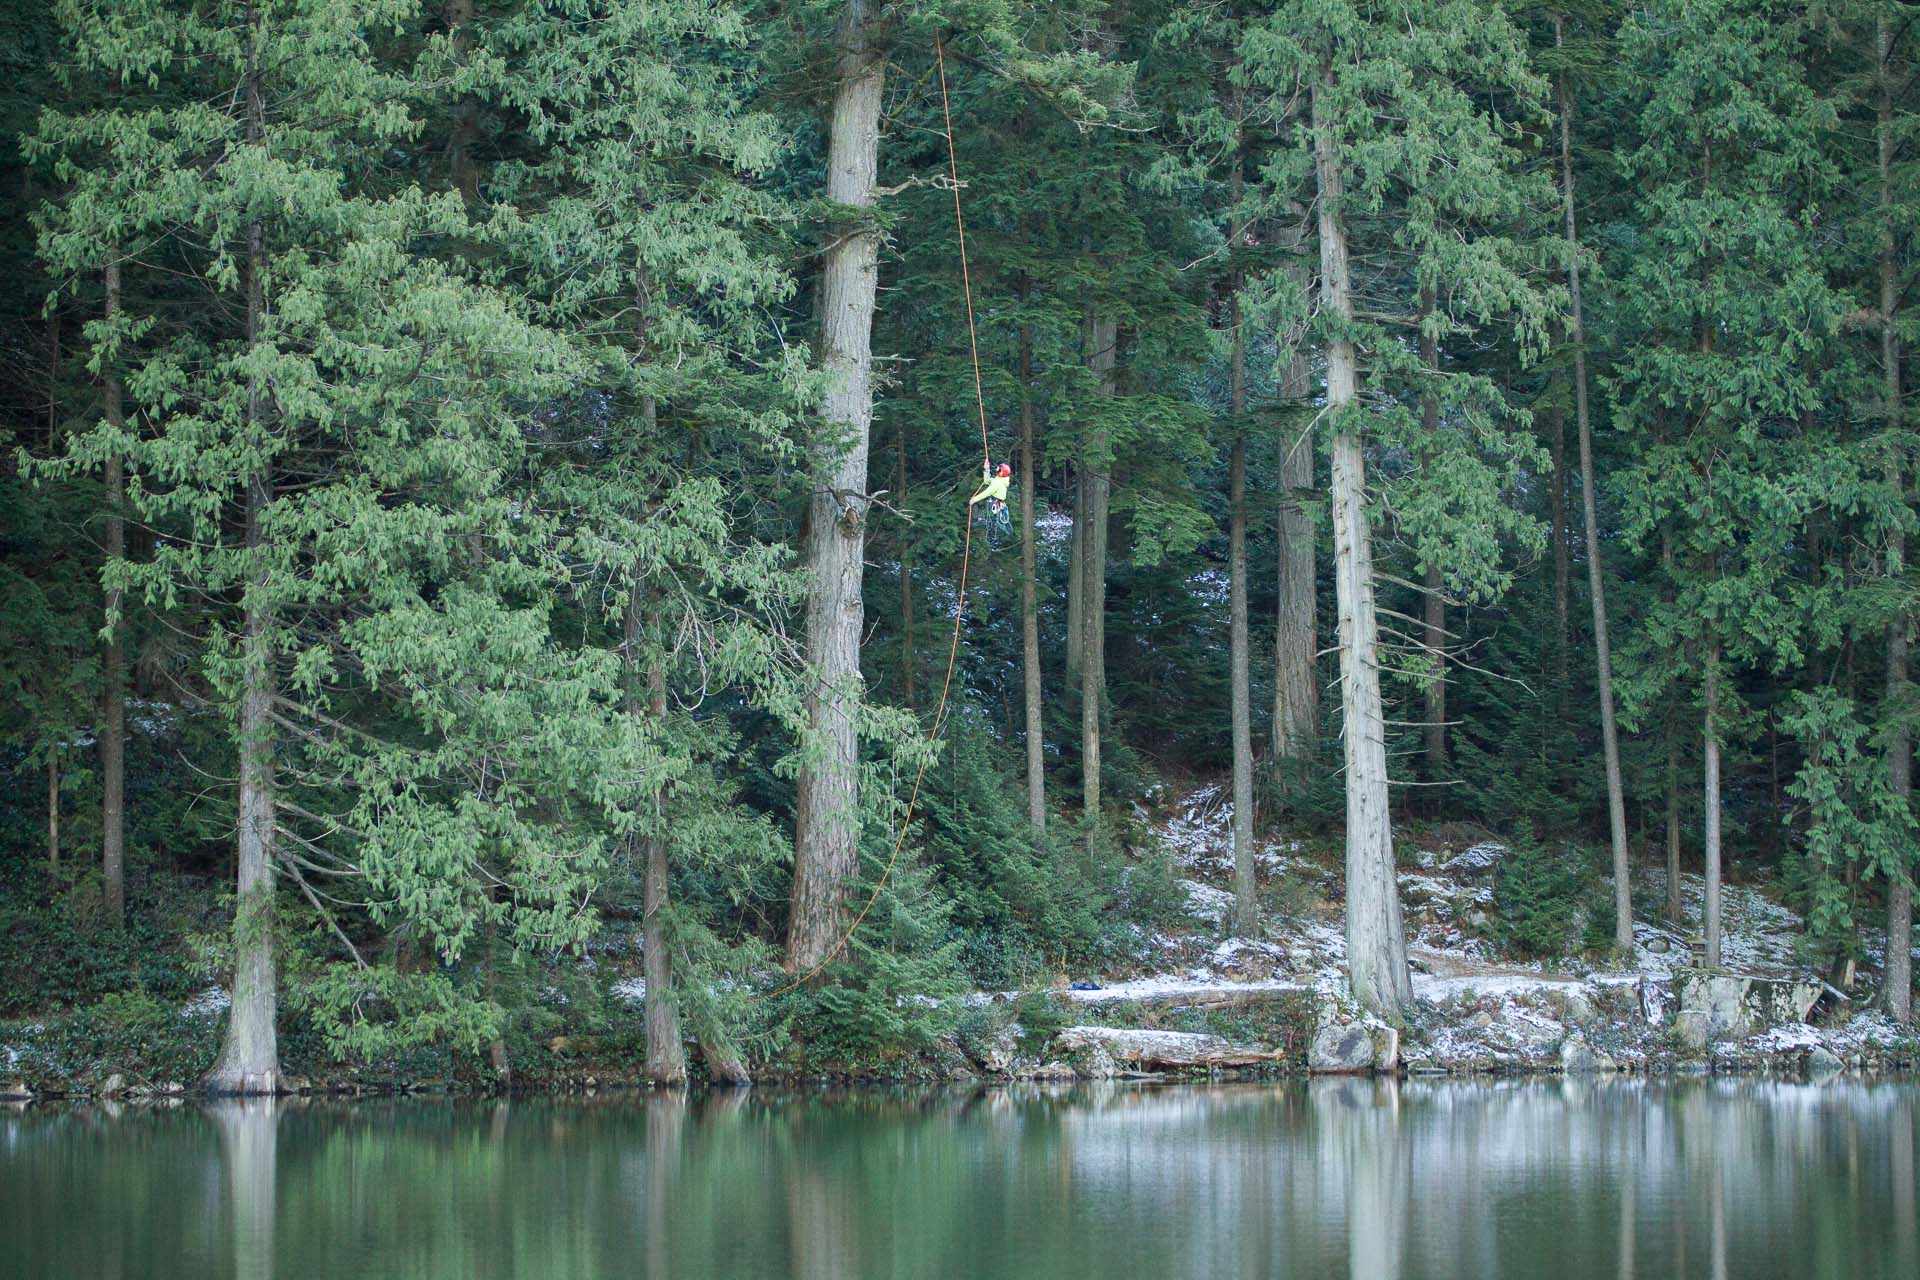 tree-climbing-at-echo-lake-2.jpg